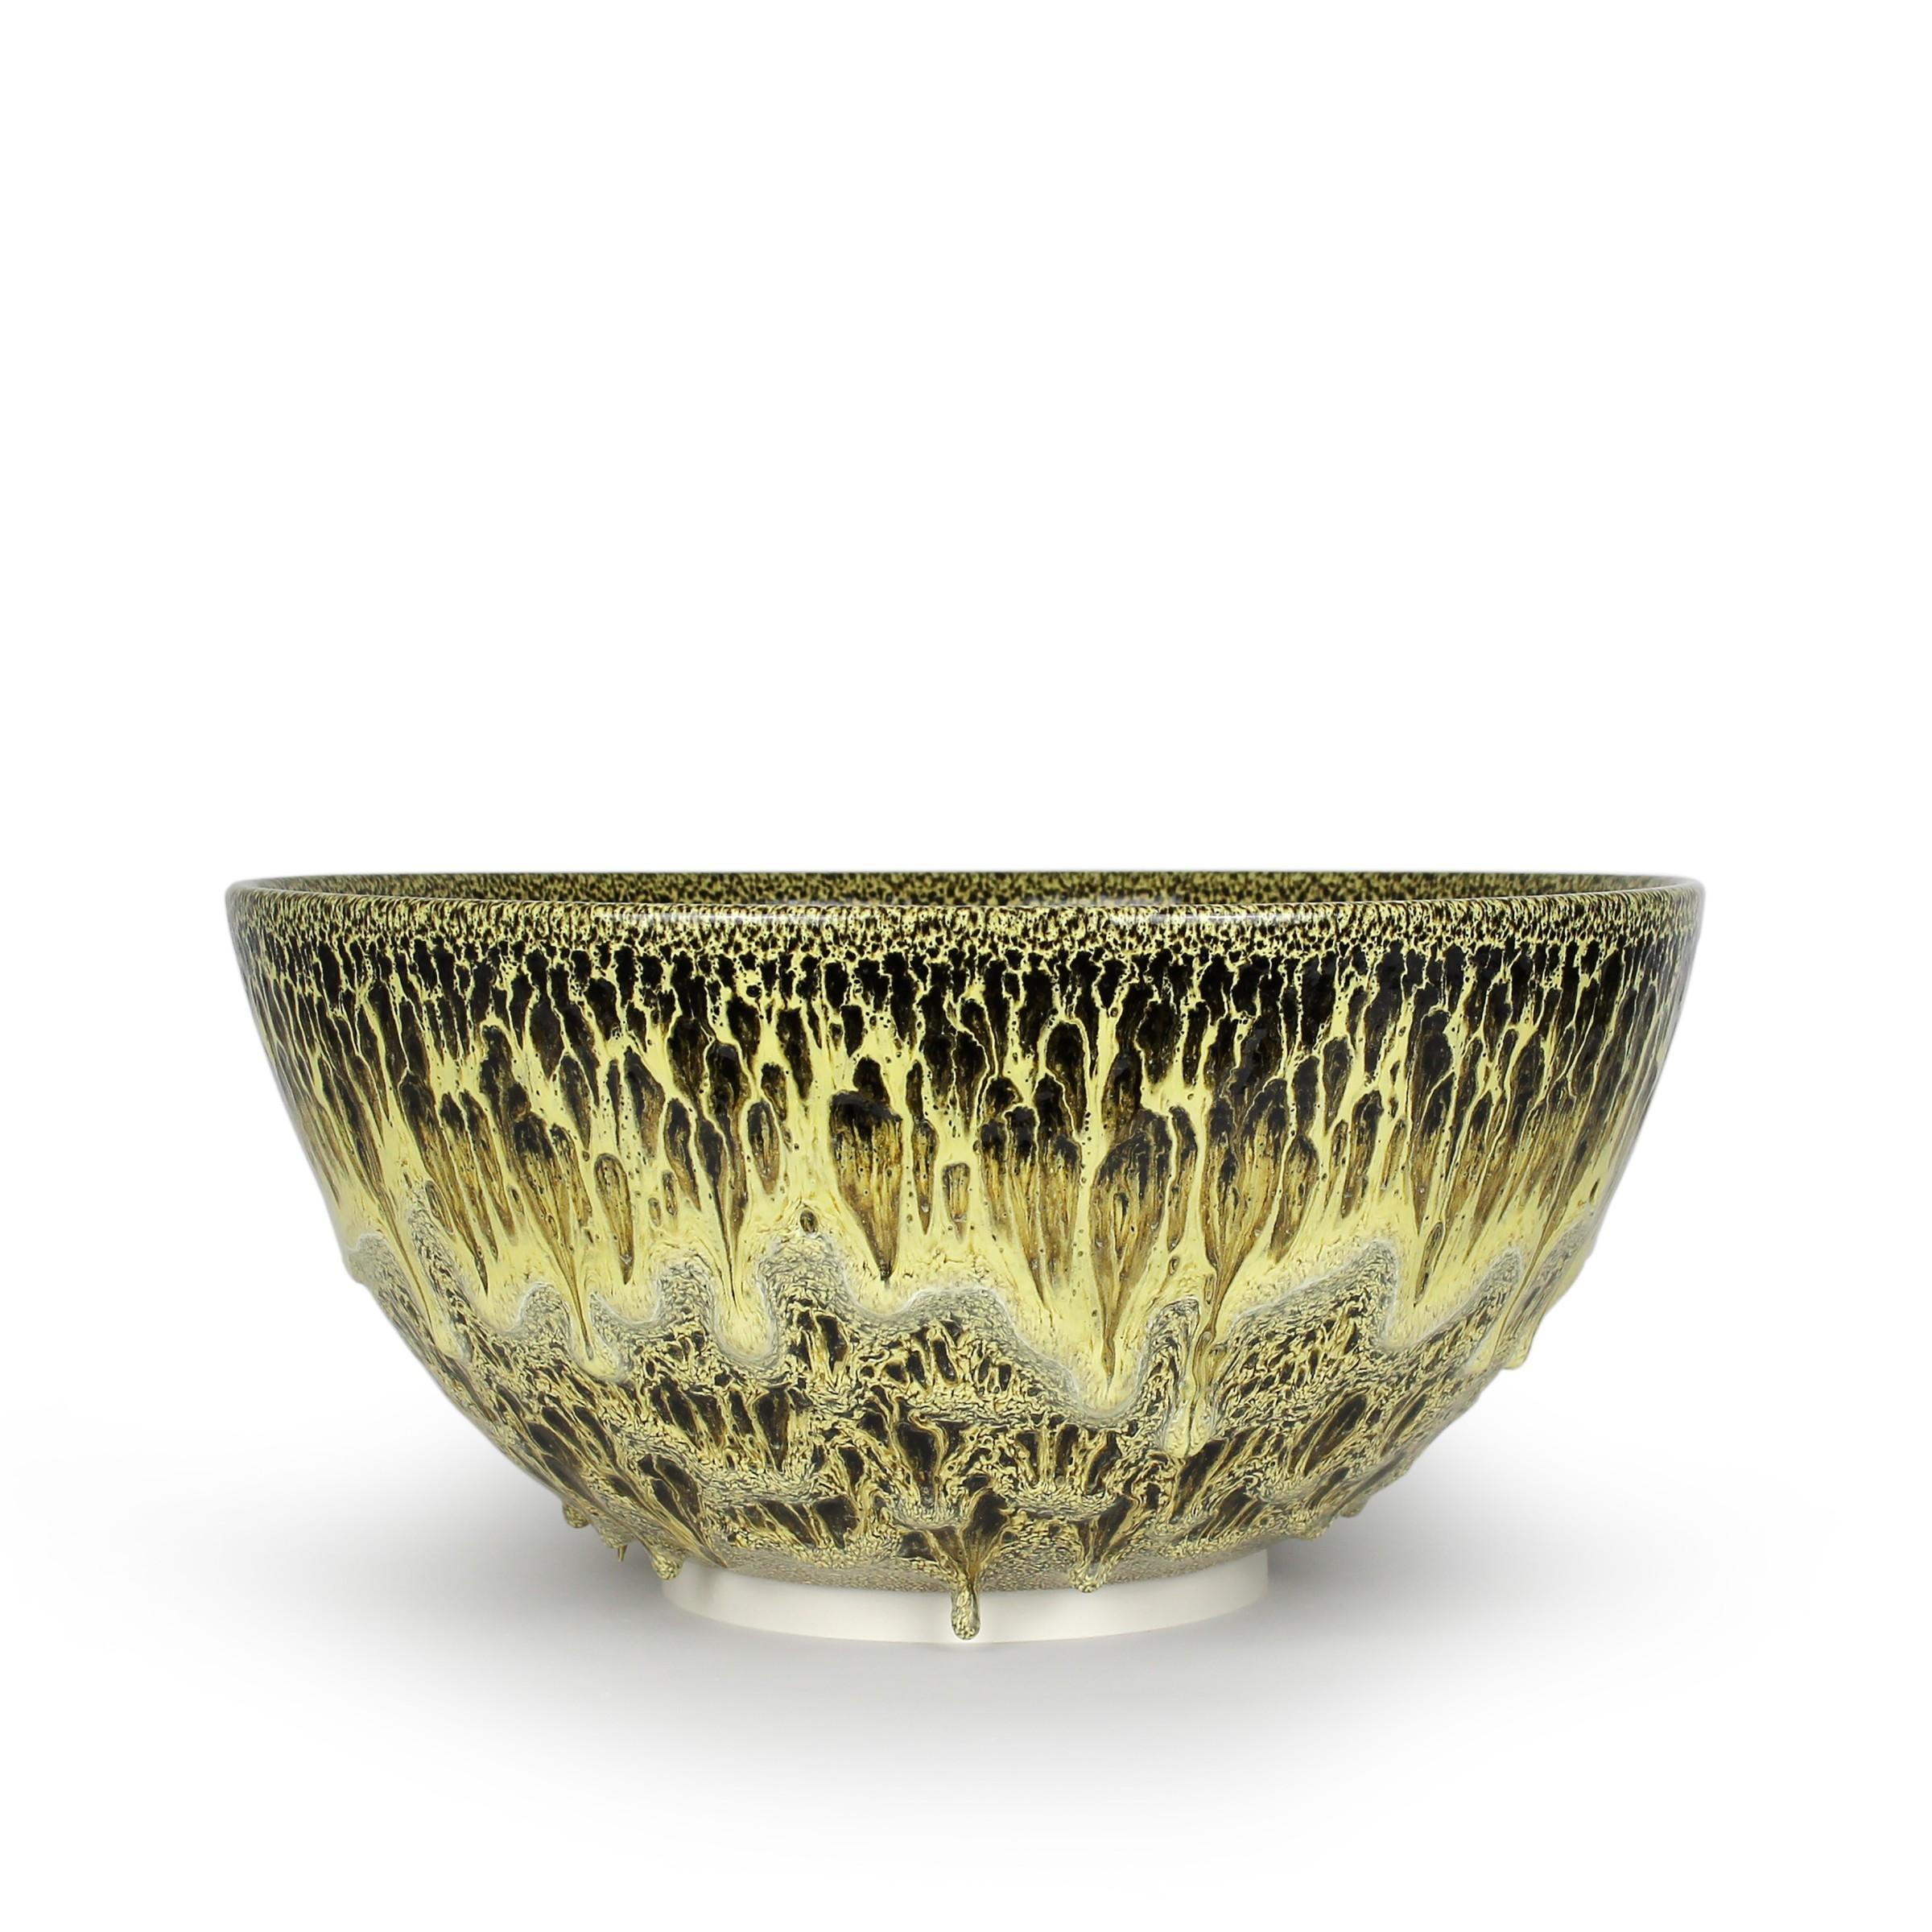 "<span class=""link fancybox-details-link""><a href=""/exhibitions/45/works/artworks3346/"">View Detail Page</a></span><div class=""artist""><strong>Albert Montserrat</strong></div><div class=""title""><em>Golden Bowl</em>, 2020</div><div class=""medium"">Oil - Spot Glazed Thrown Porcelain</div><div class=""dimensions"">23 x 49 x 49 cm<br>9 1/8 x 19 1/4 x 19 1/4 in.</div>"